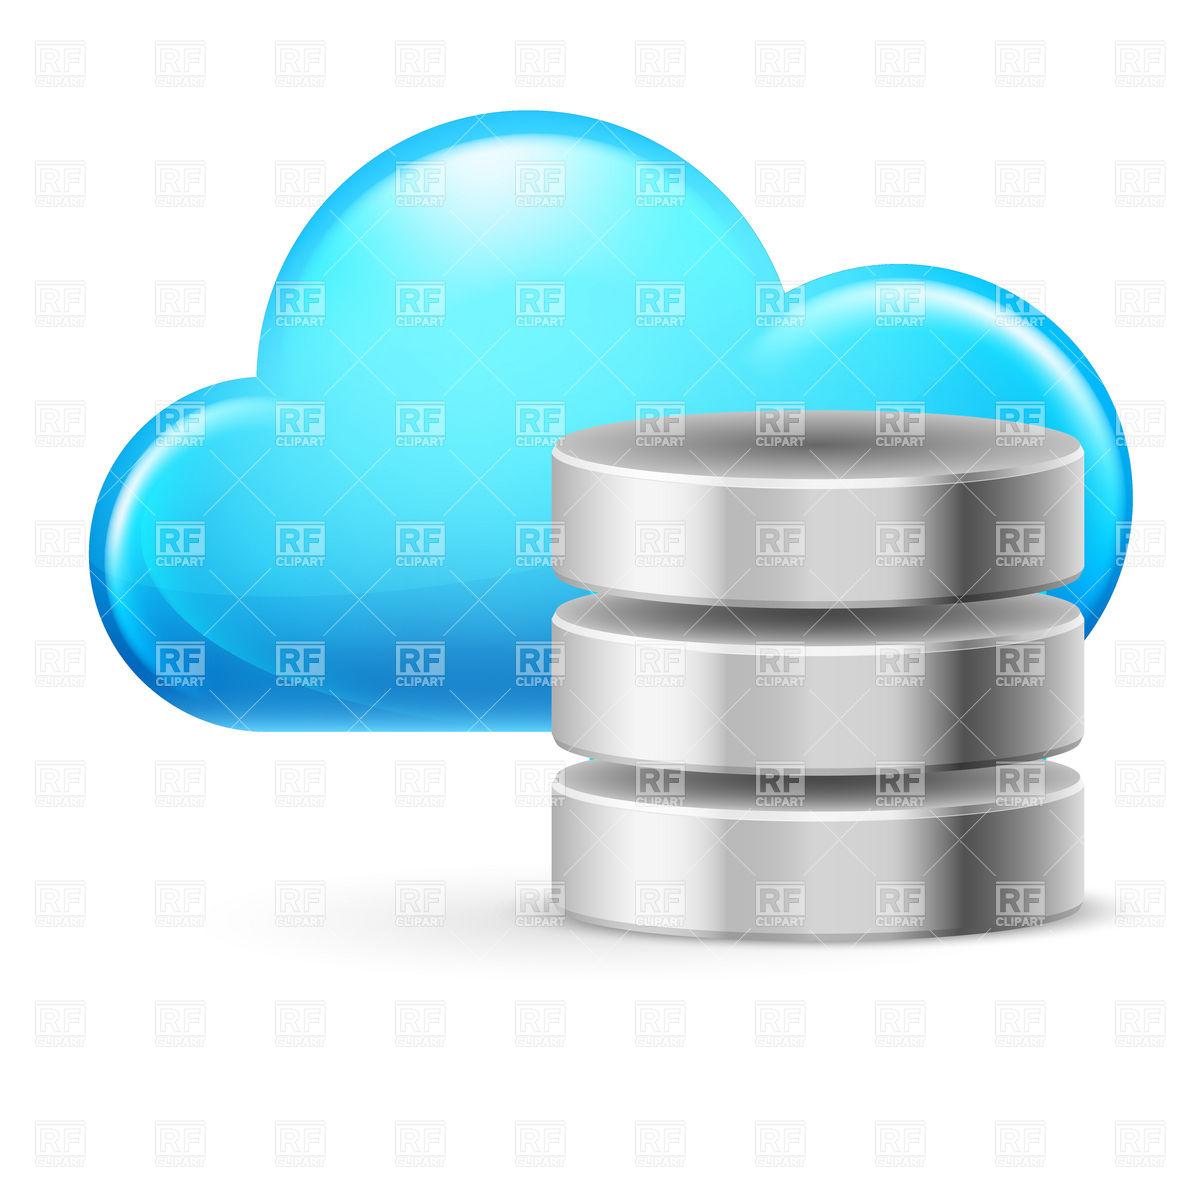 1200x1200 Cloud Computing